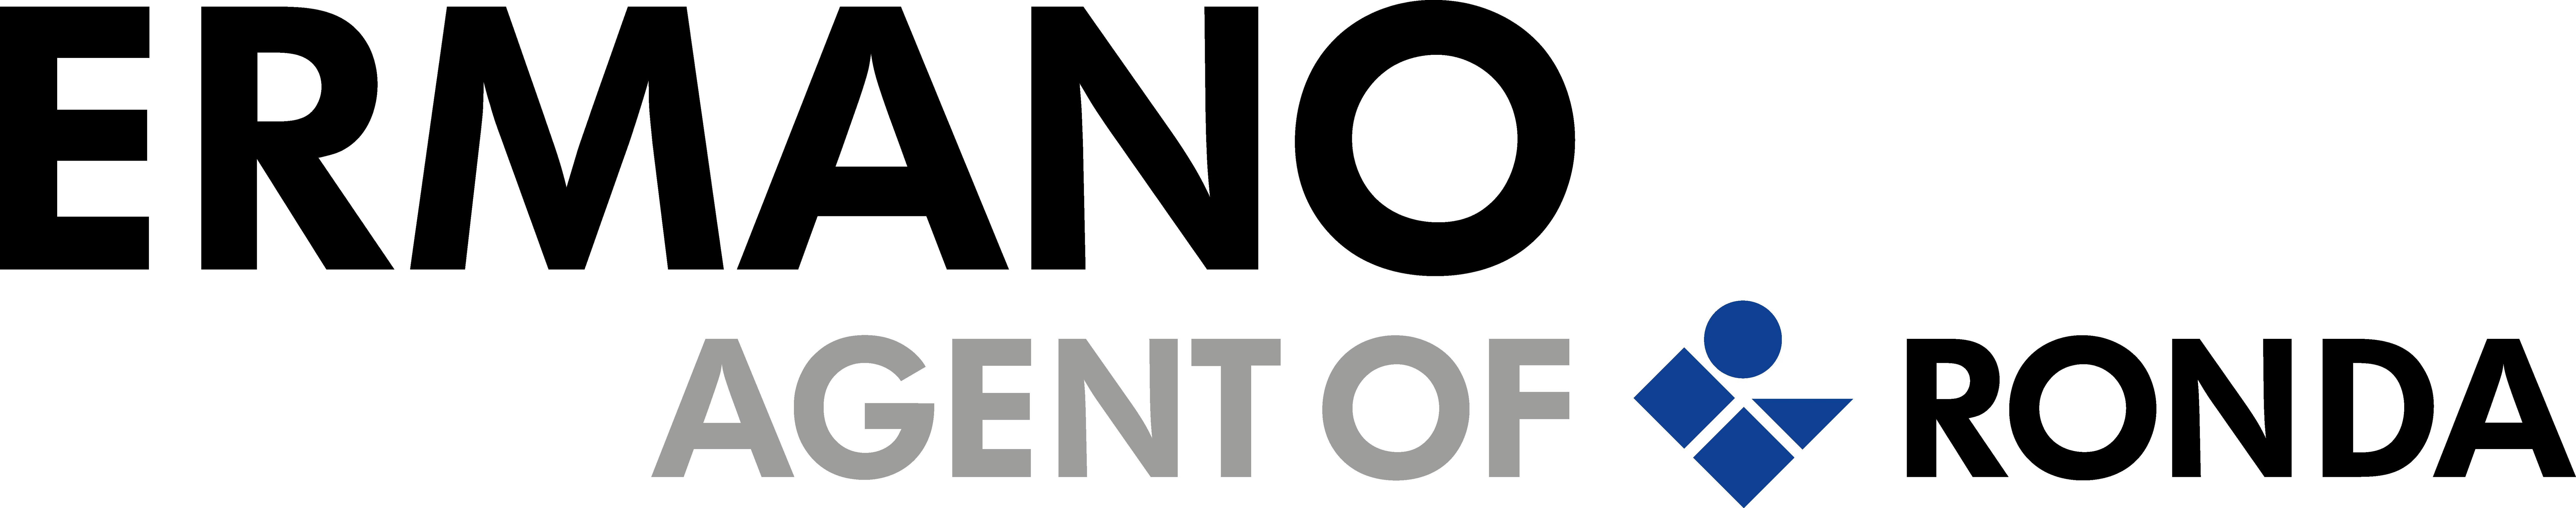 ERMANO – AGENT OF RONDA